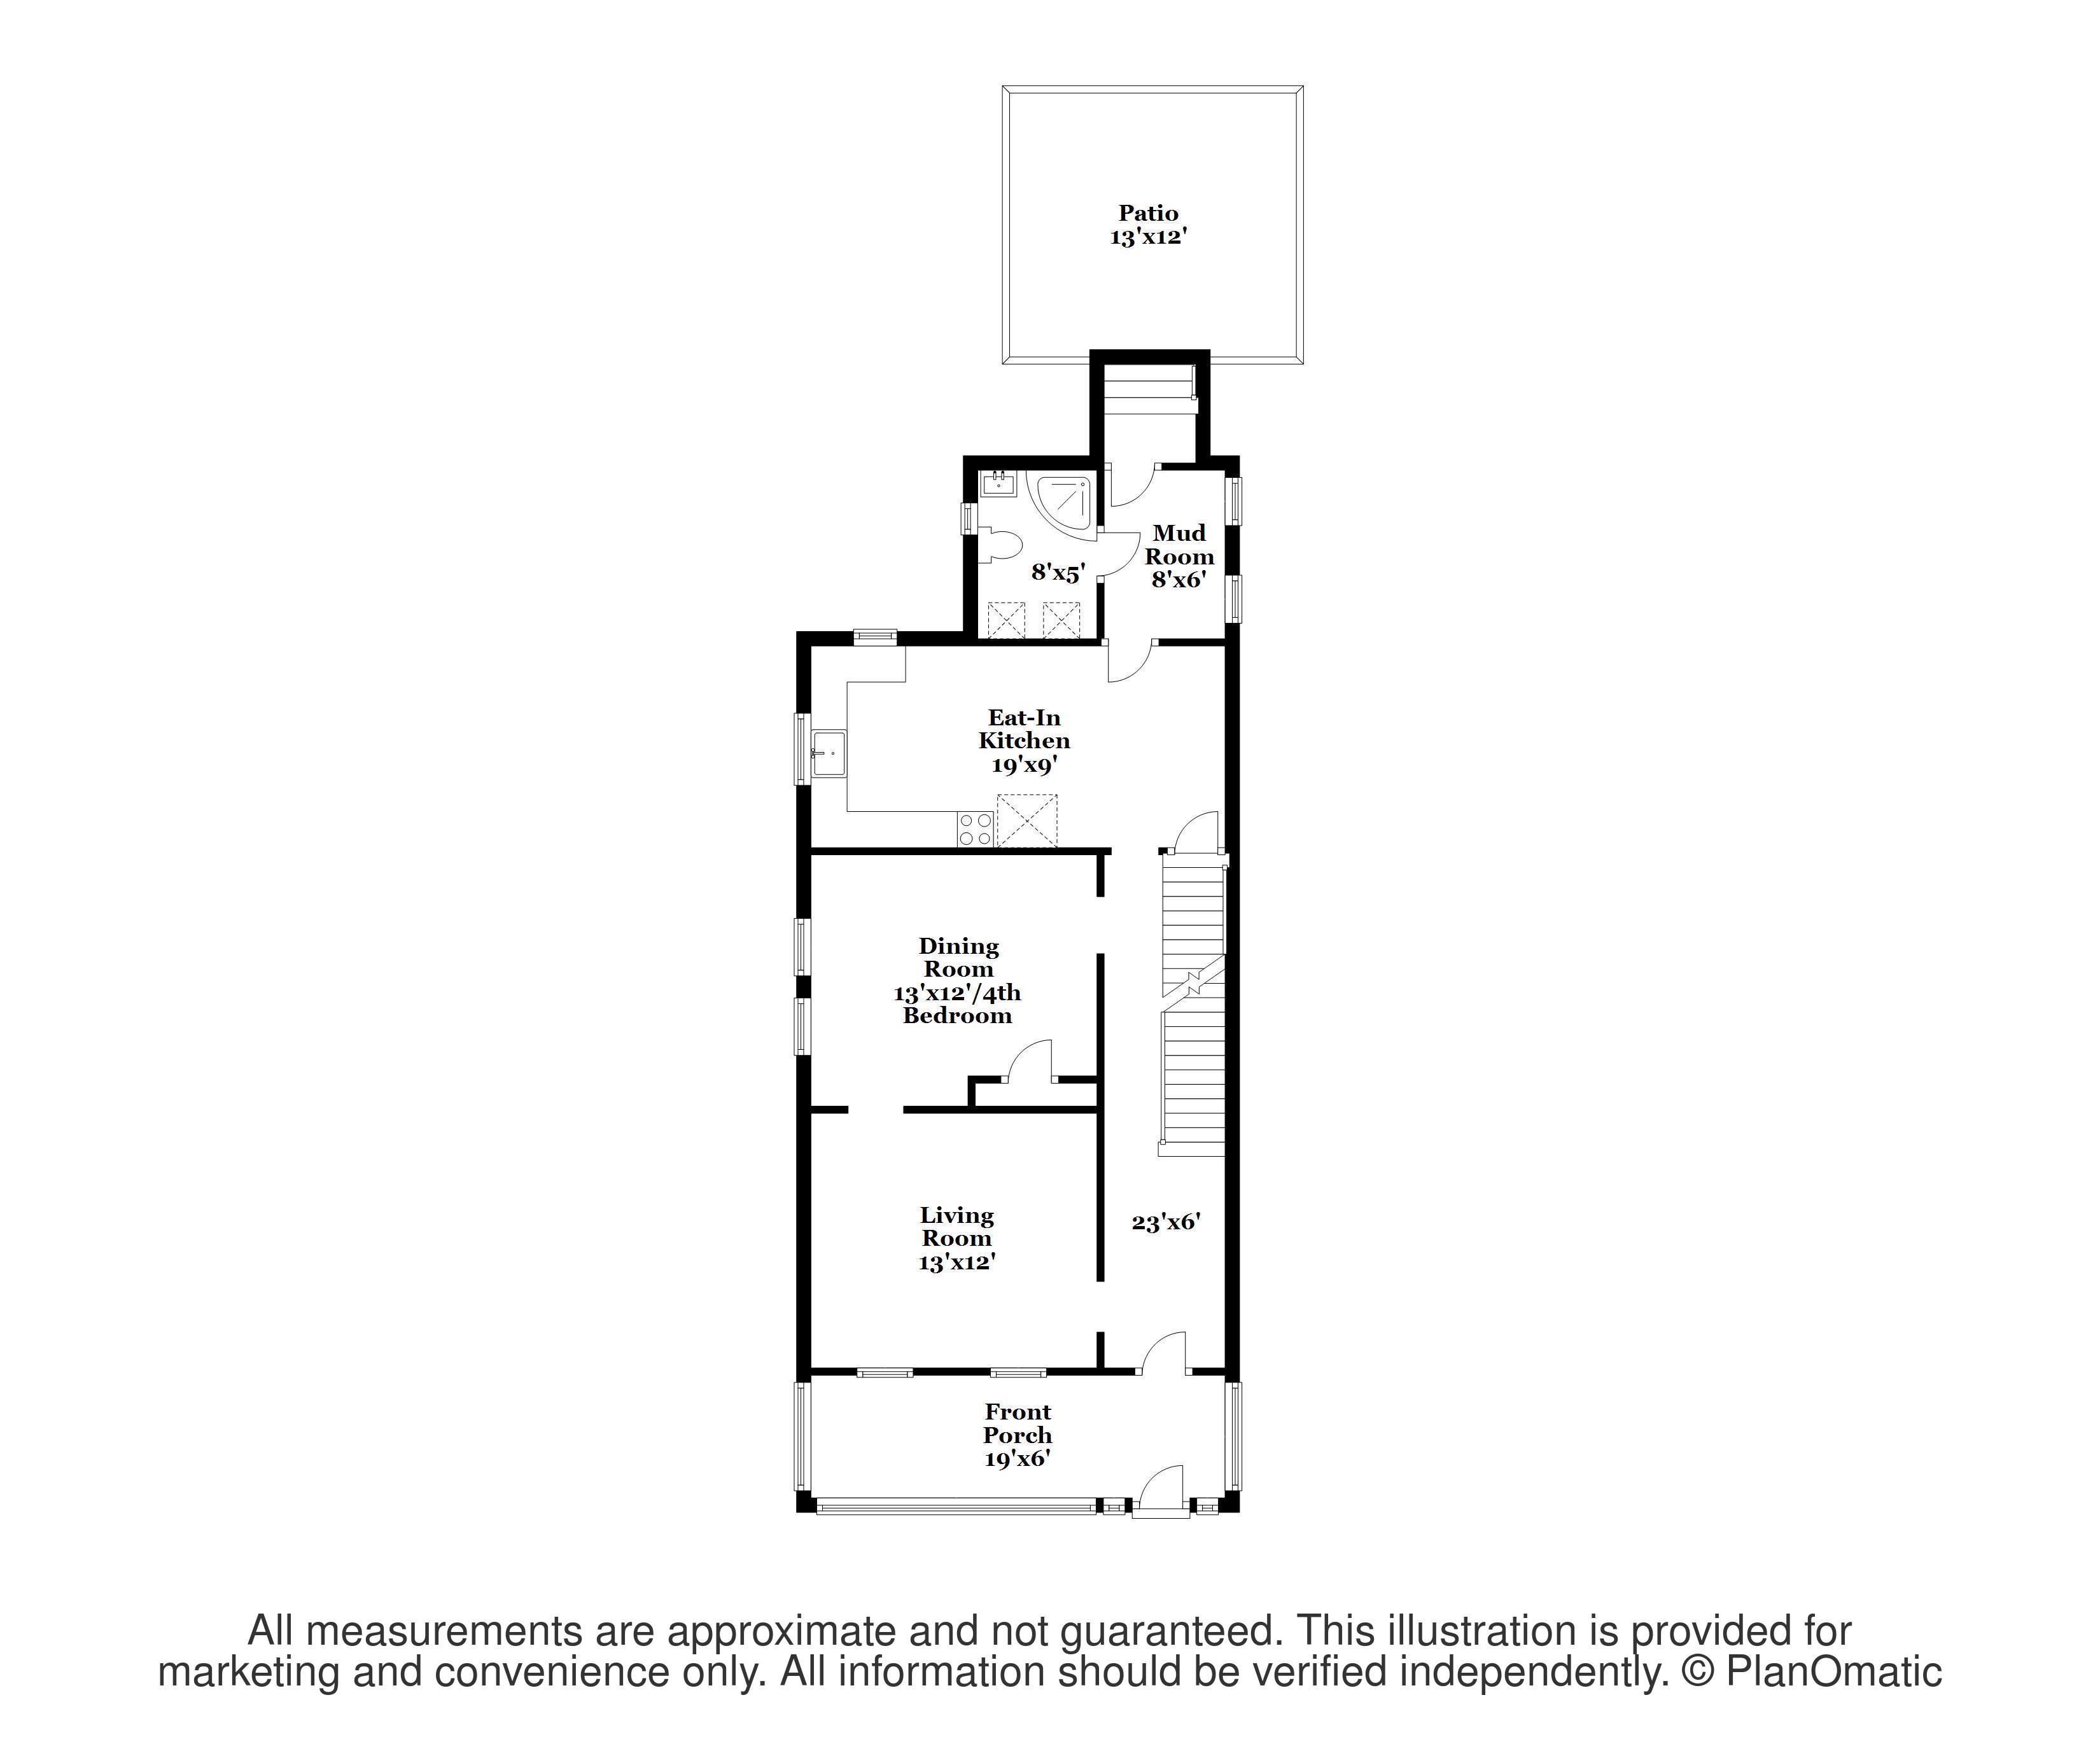 single family homes para Venda às Freshened In-Town 3-4 Bedroom with 3 Parking Spots 20 Leigh Avenue, Princeton, Nova Jersey 08540 Estados Unidos